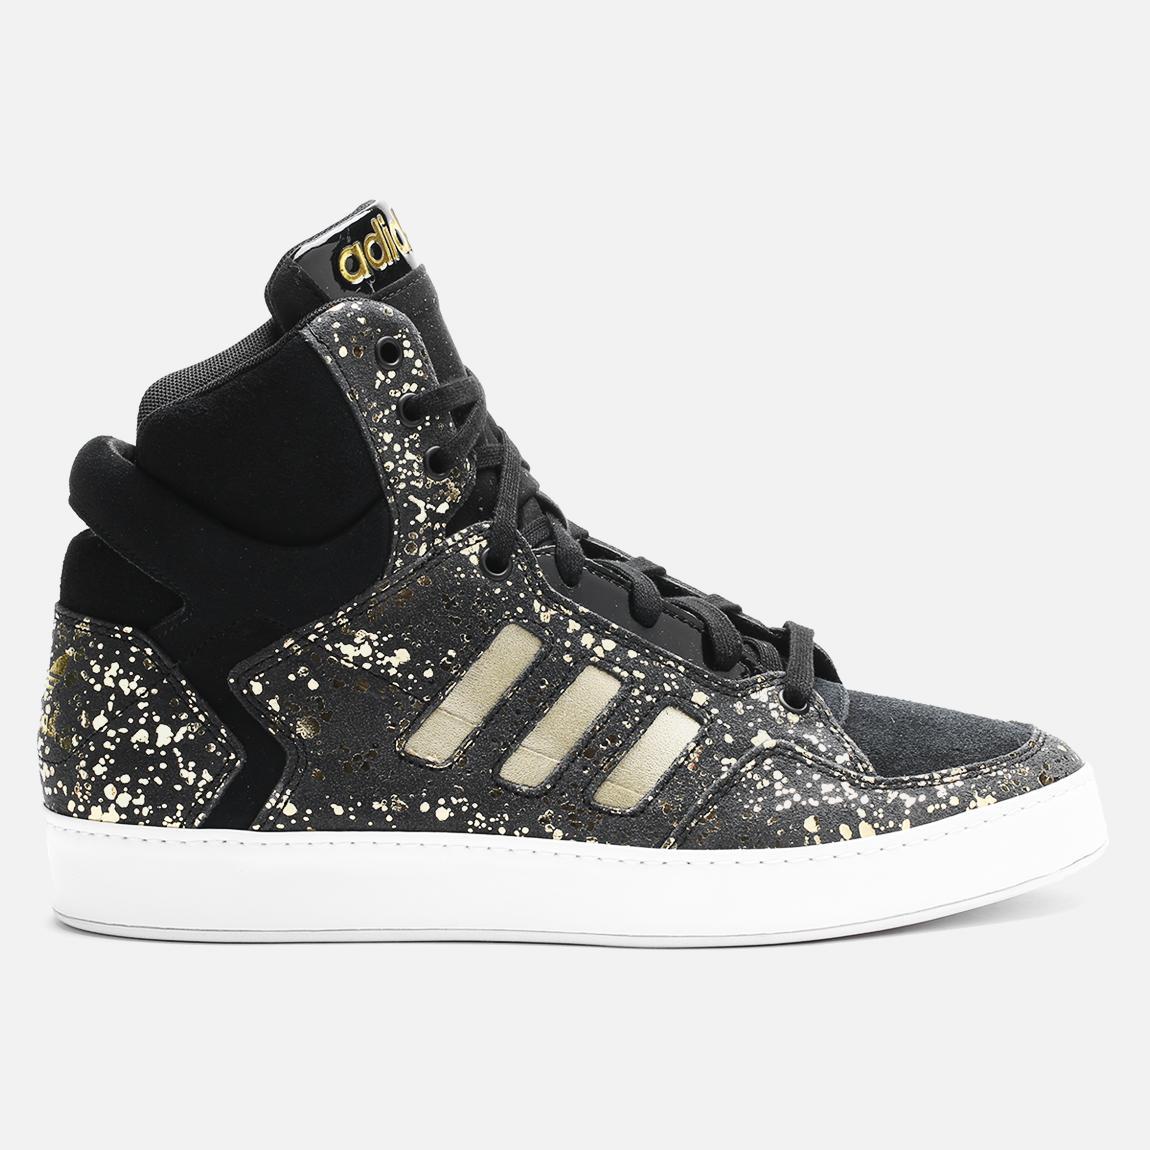 b3b389c06f3 Bankshot 2.0 - black adidas Originals Sneakers